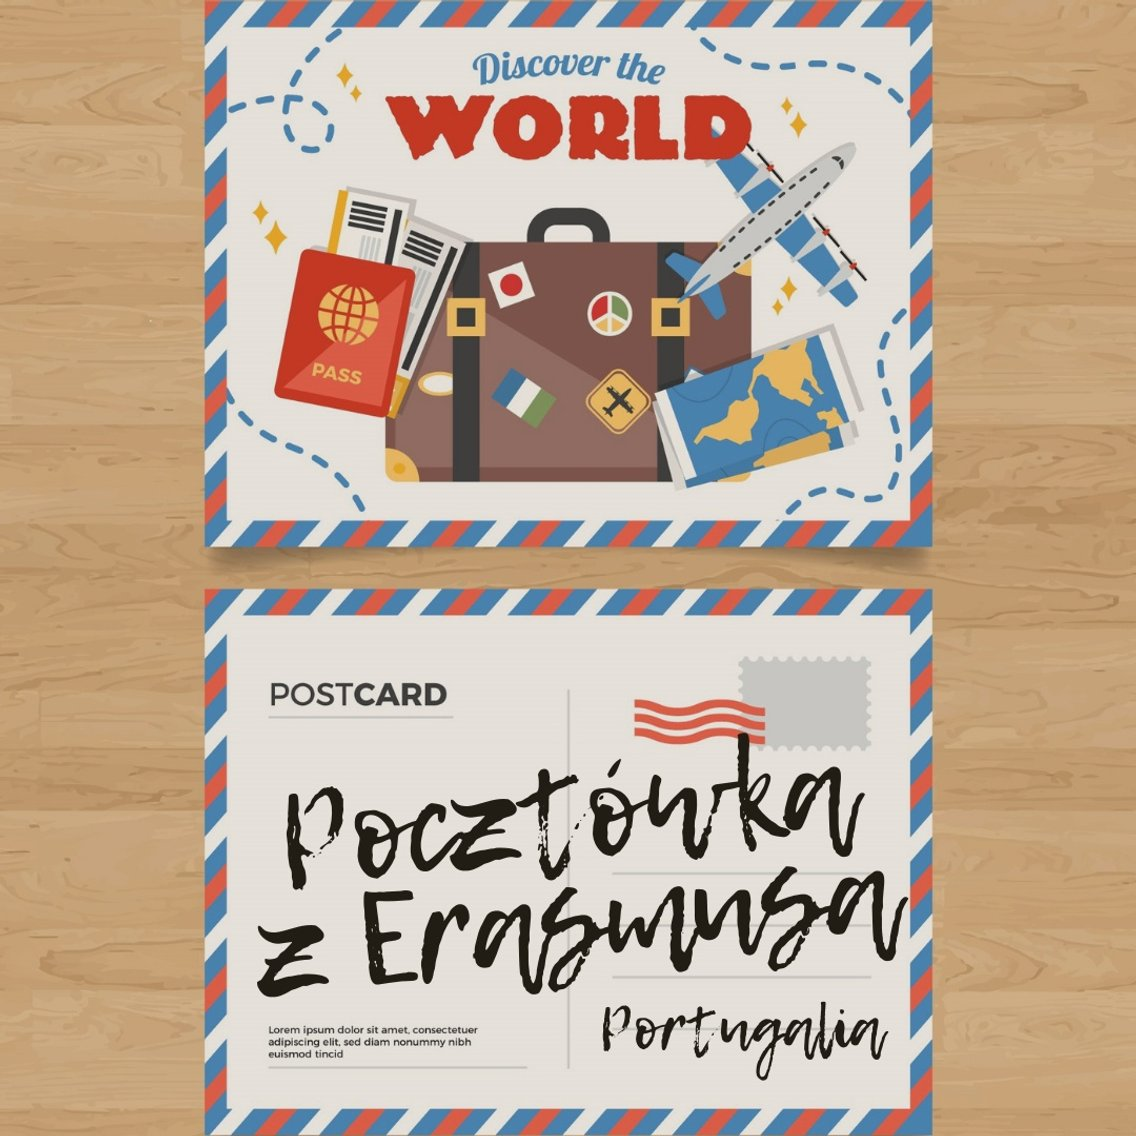 Pocztówka z Erasmusa 2 - Portugalia - imagen de portada